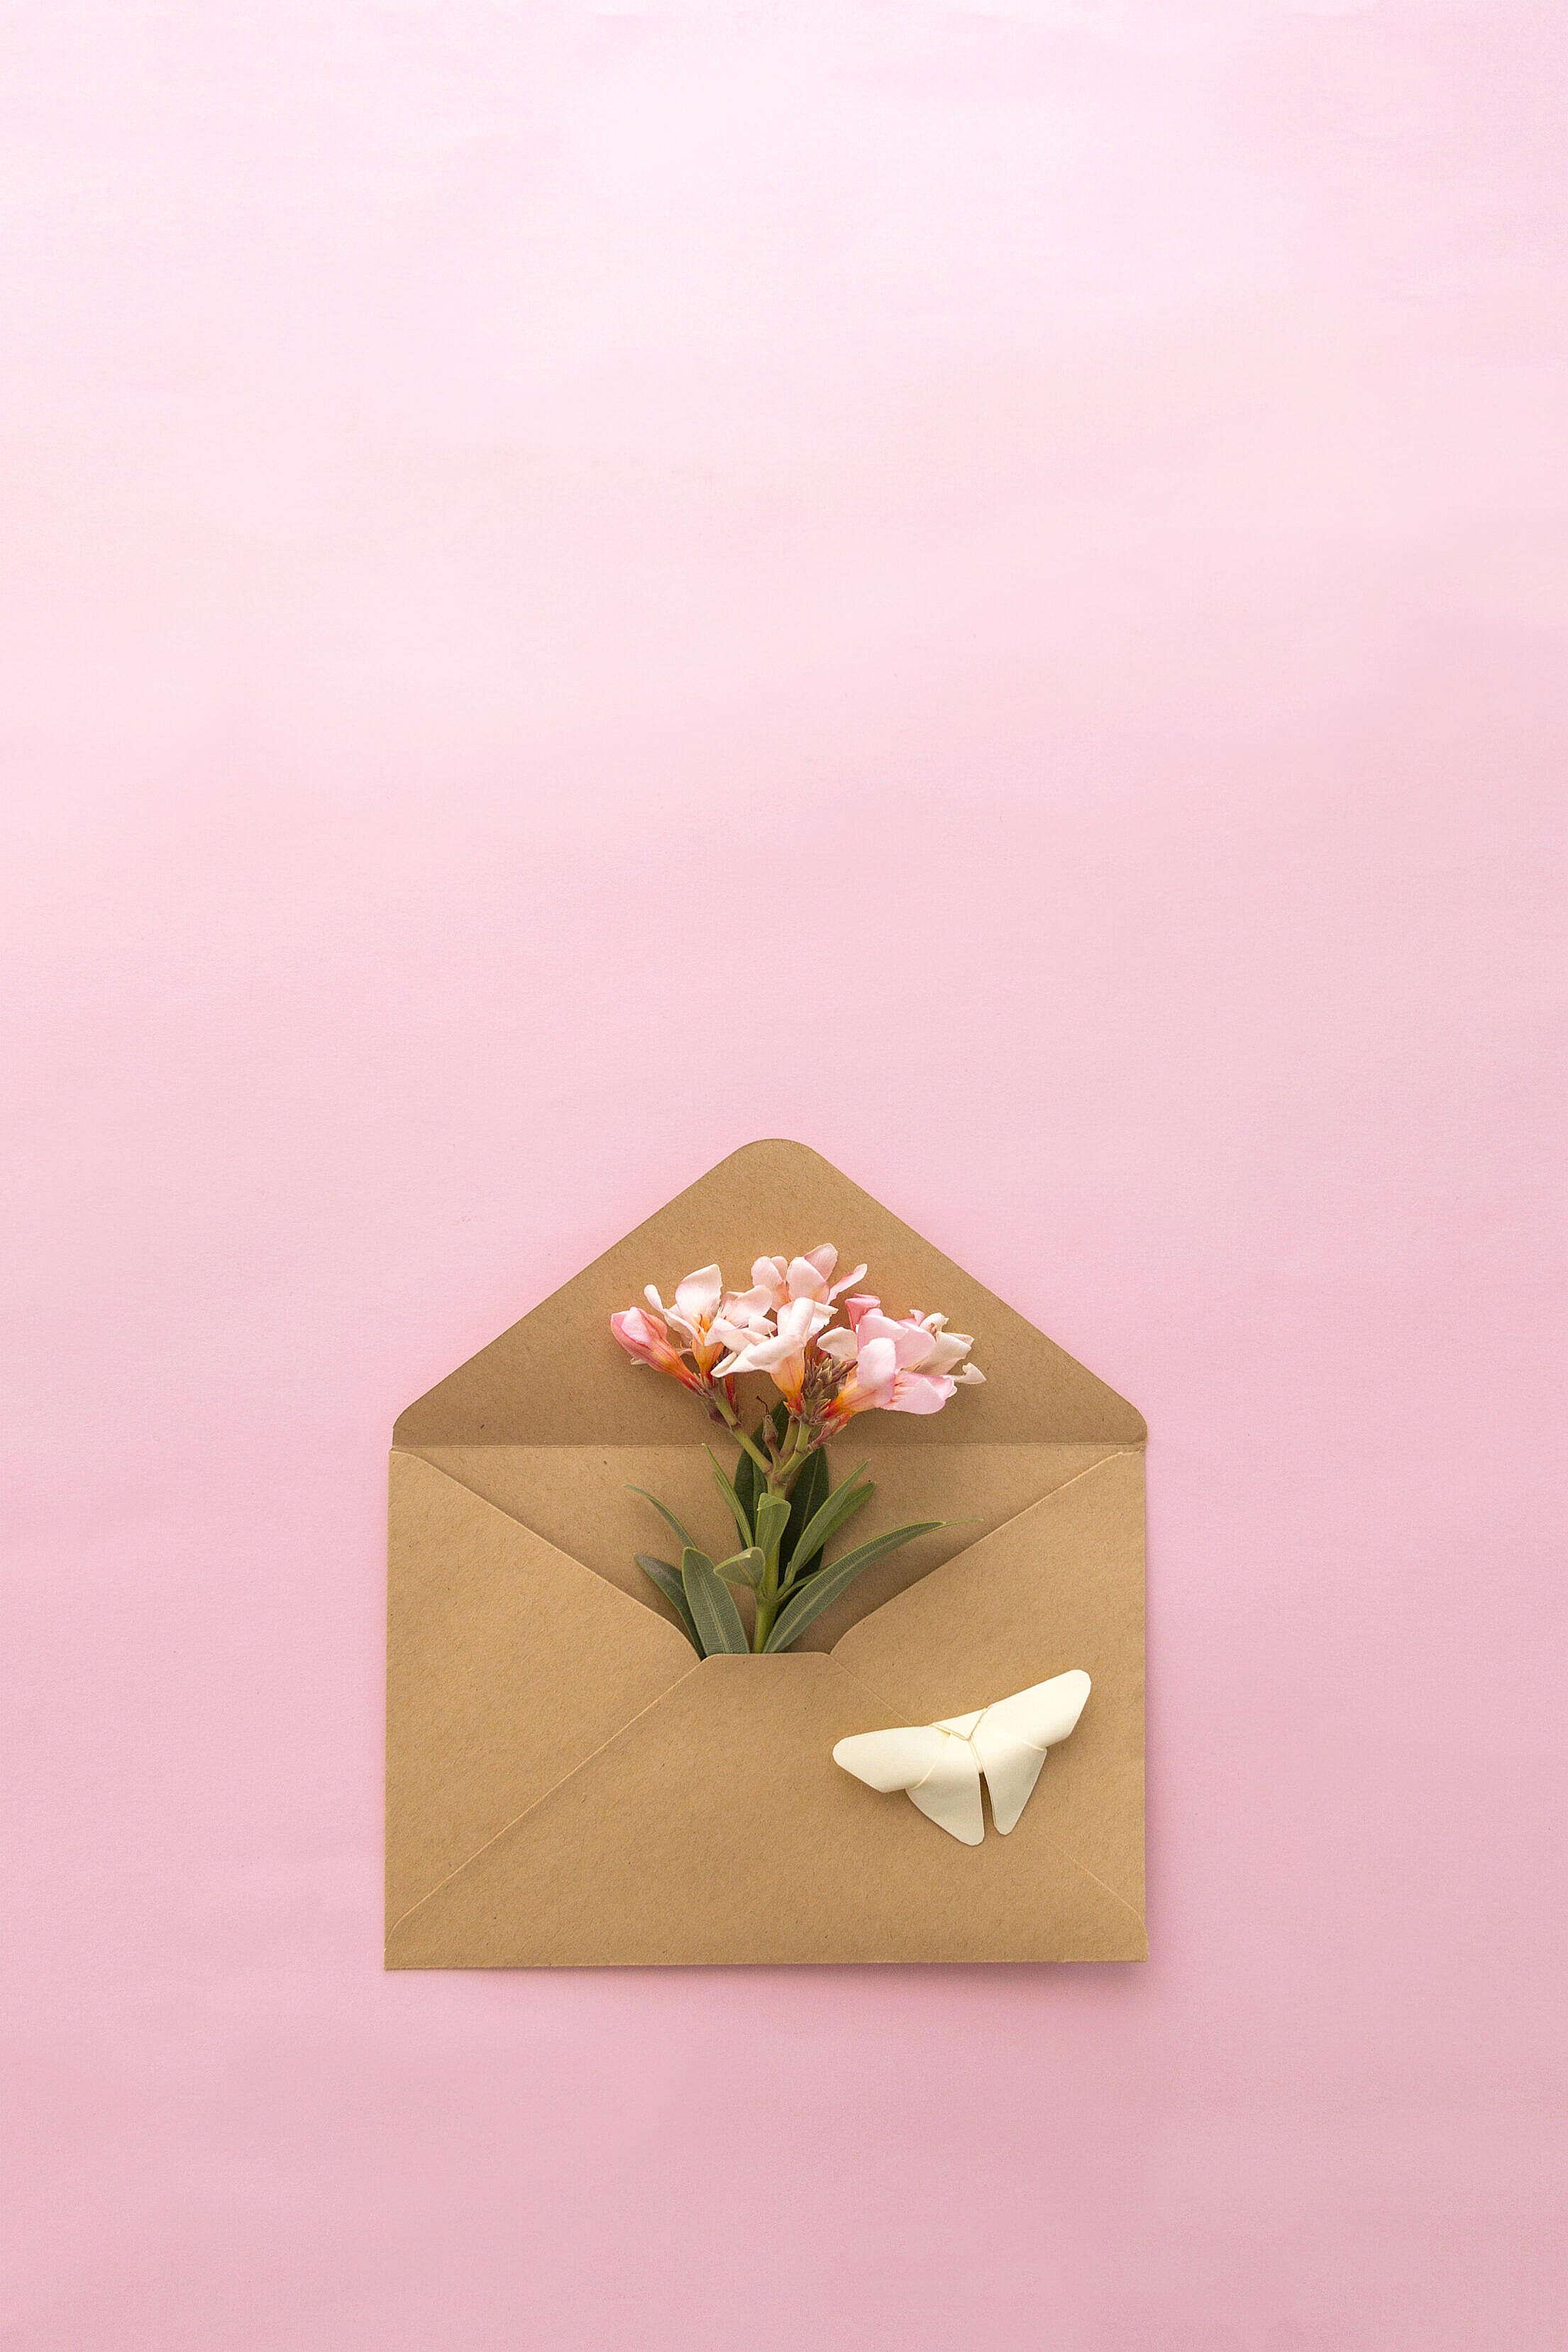 Retro Envelope with Flowers Inside Free Stock Photo